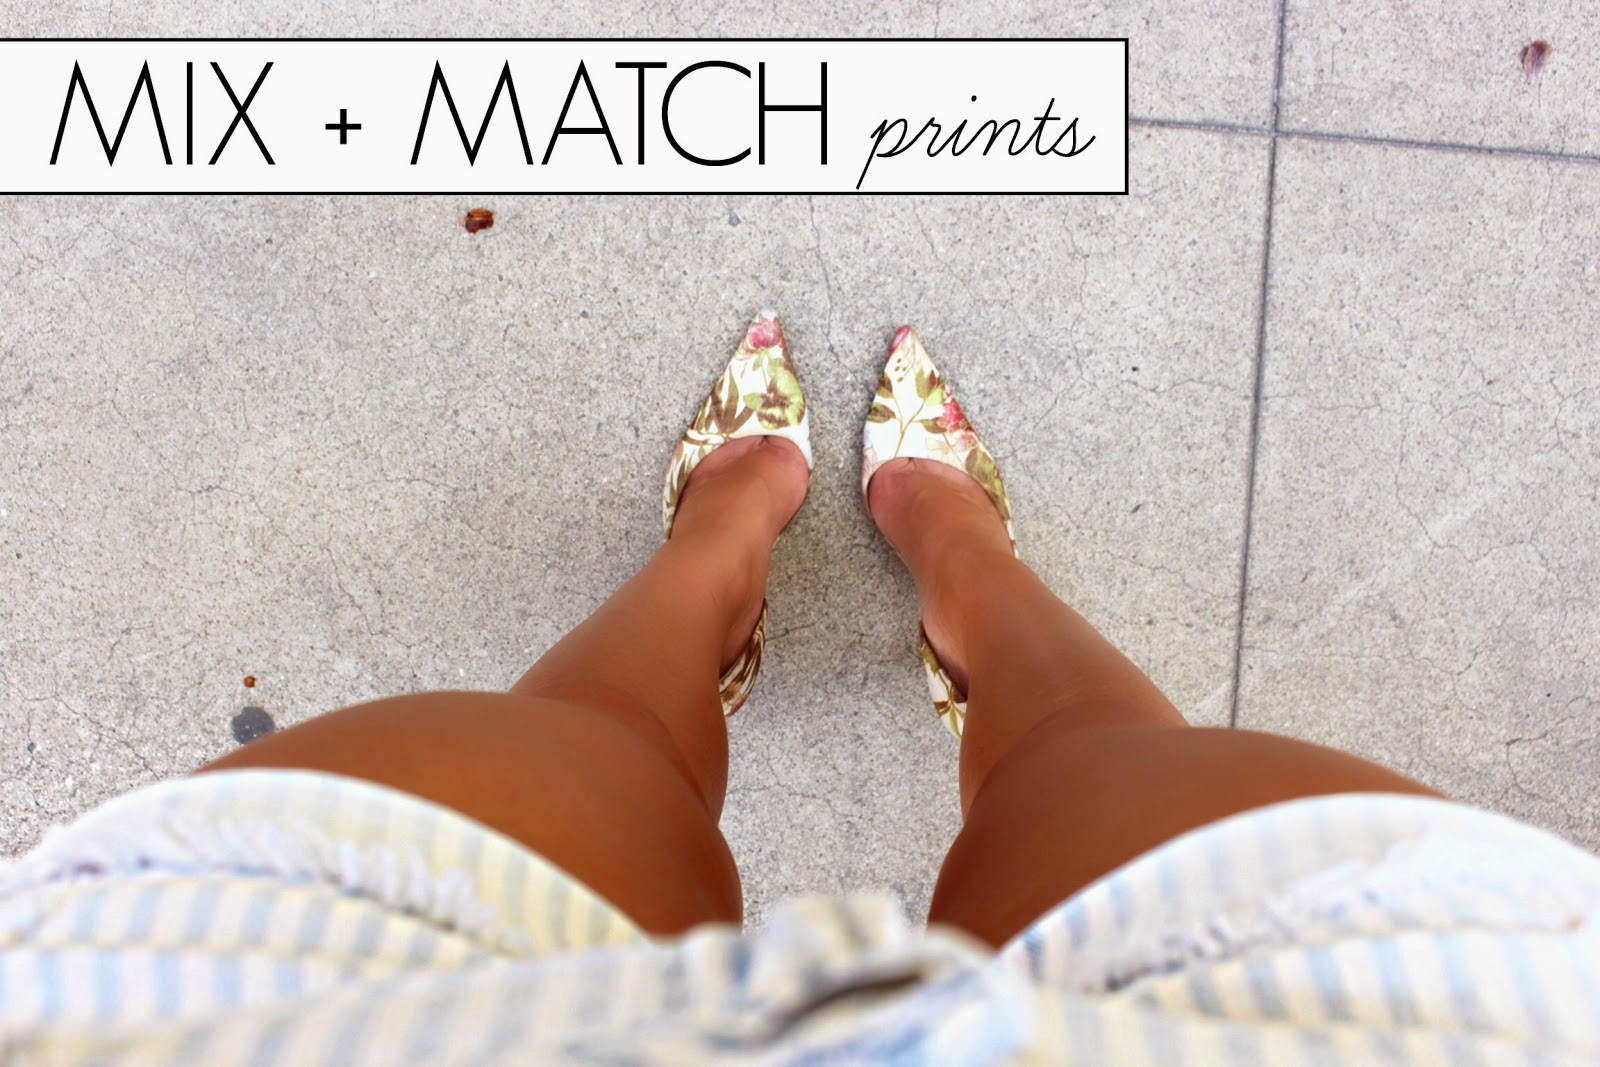 http://www.mepoopsie.com/2014/09/mix-match-prints.html